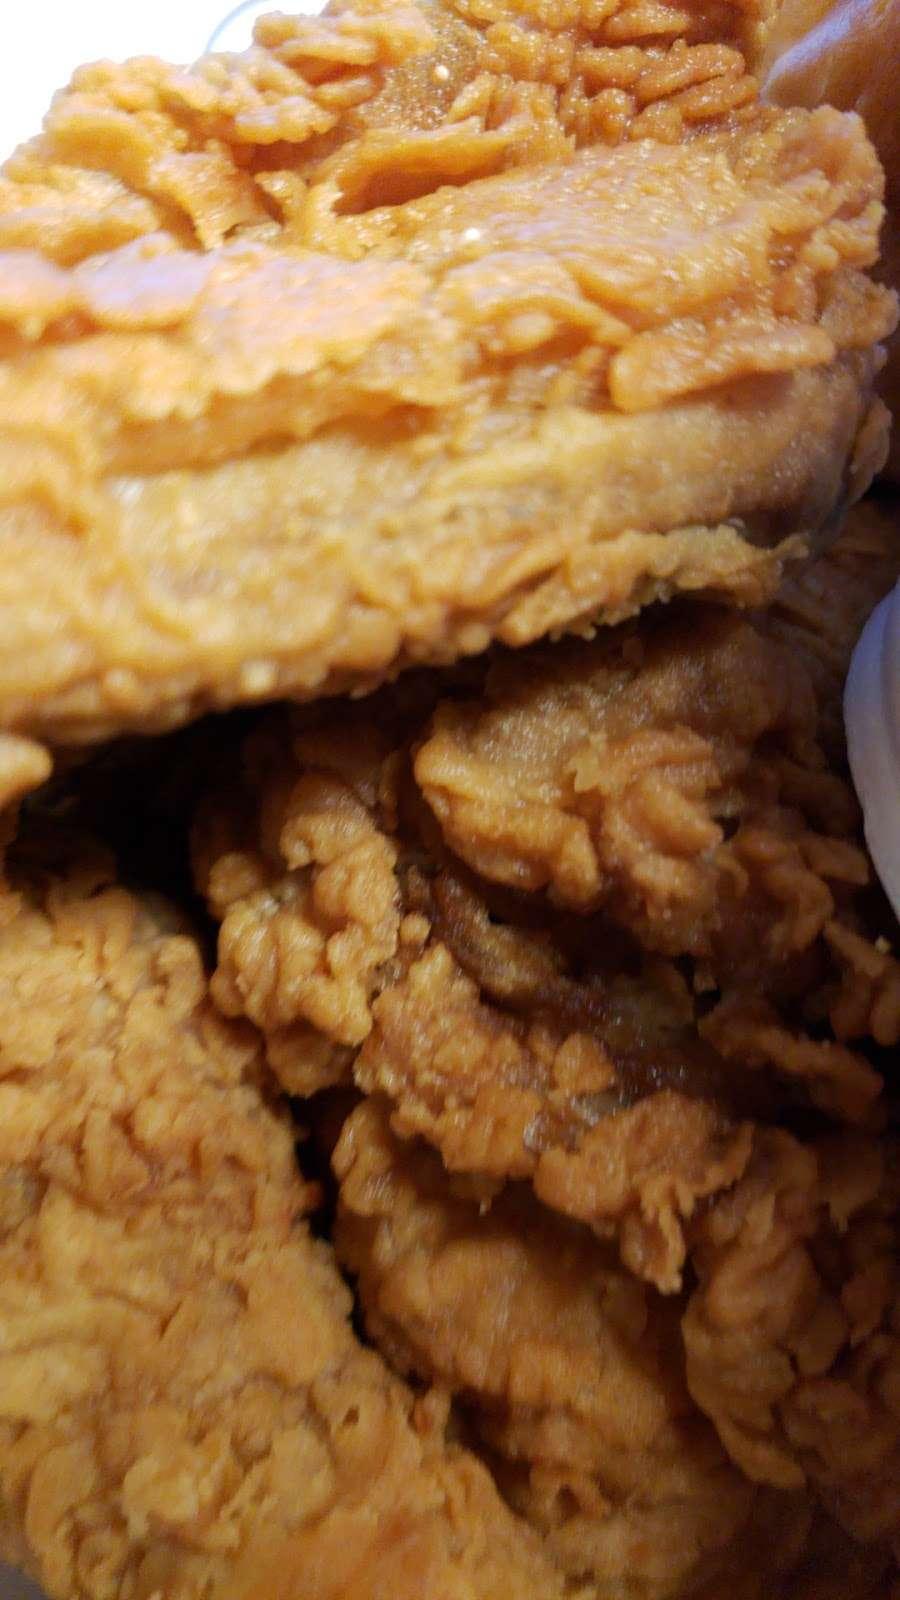 Hartz Chicken Buffet - restaurant    Photo 10 of 10   Address: 7590 N Wayside Dr, Houston, TX 77028, USA   Phone: (713) 633-8600